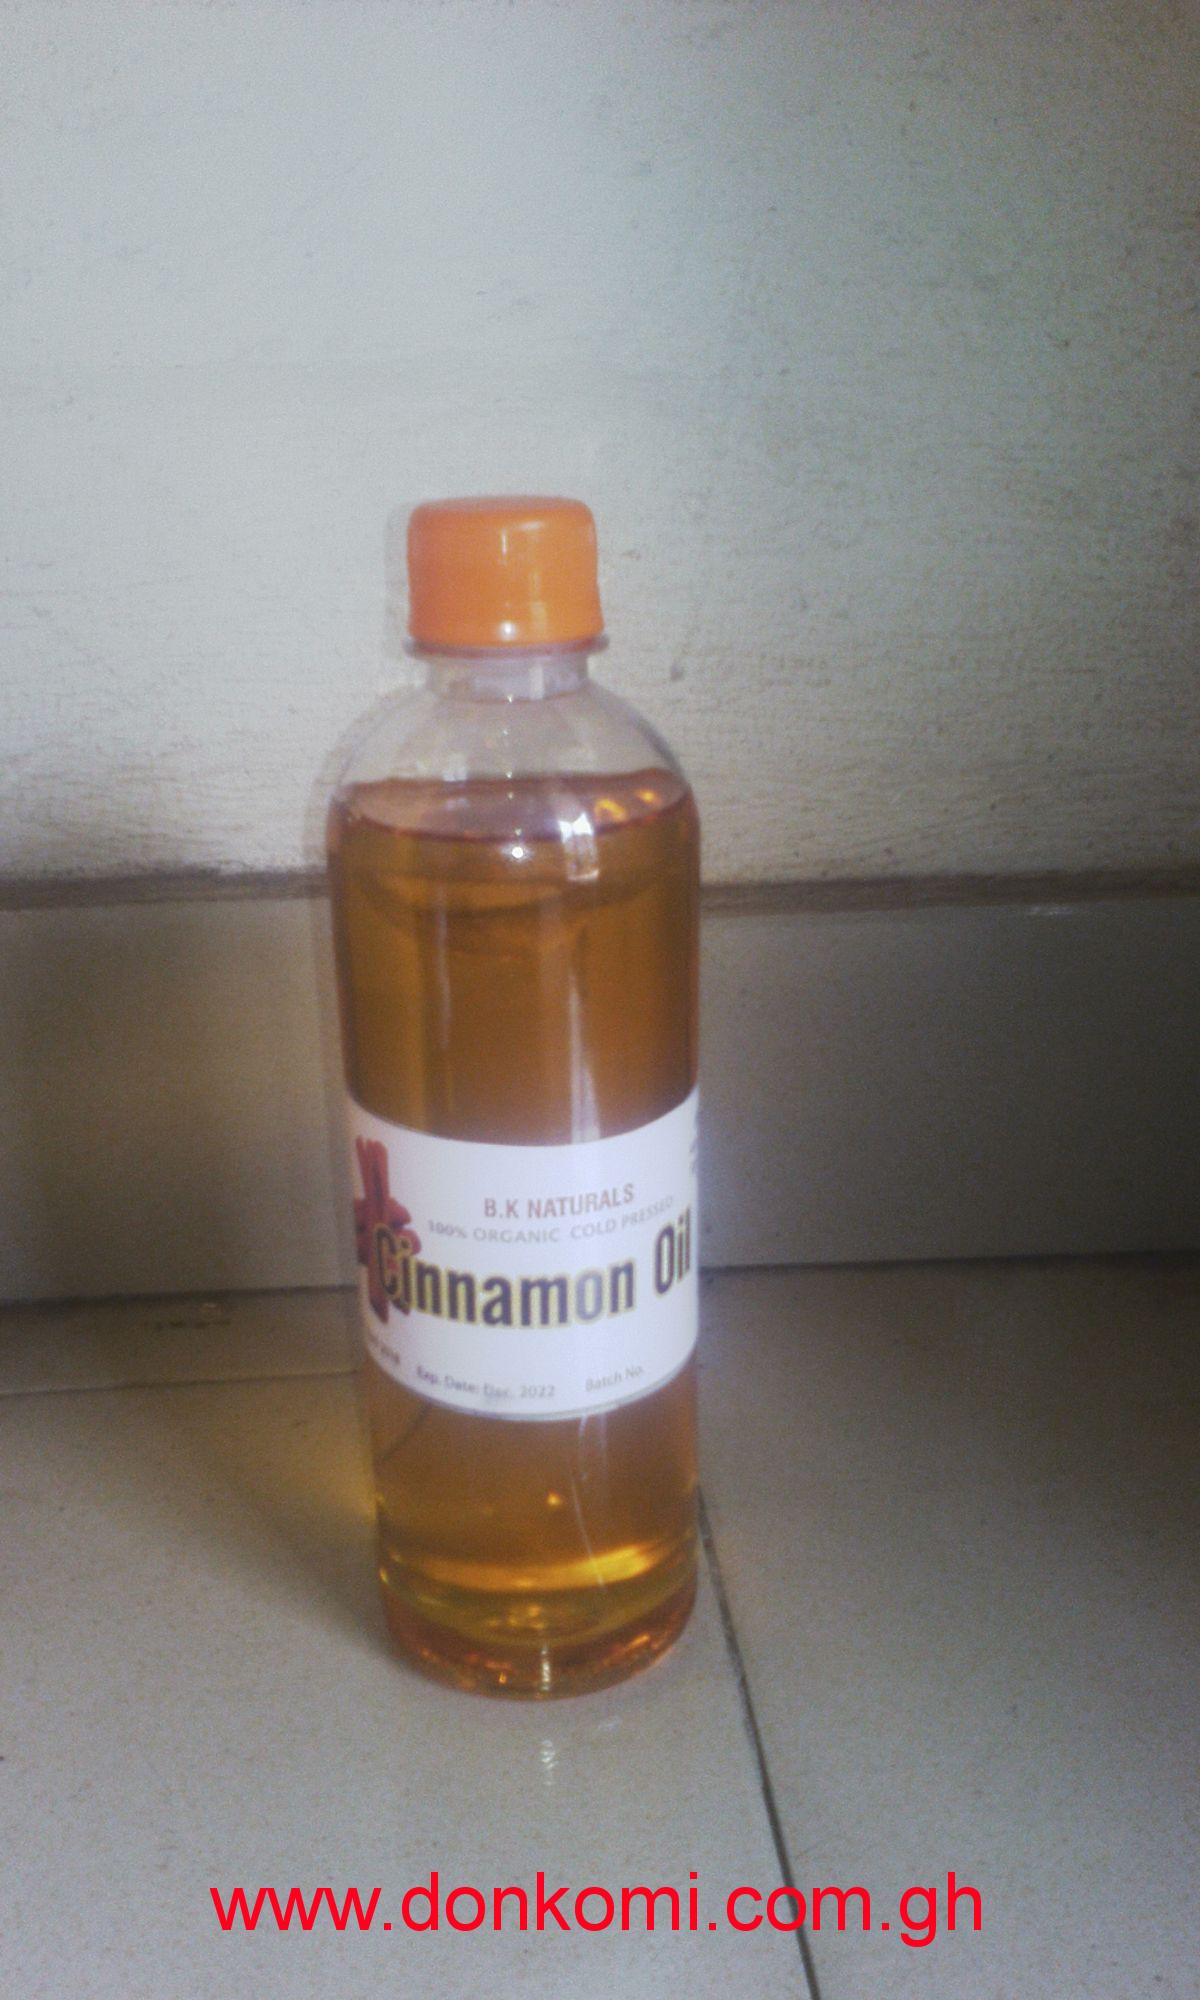 NATURAL CINNAMON OIL